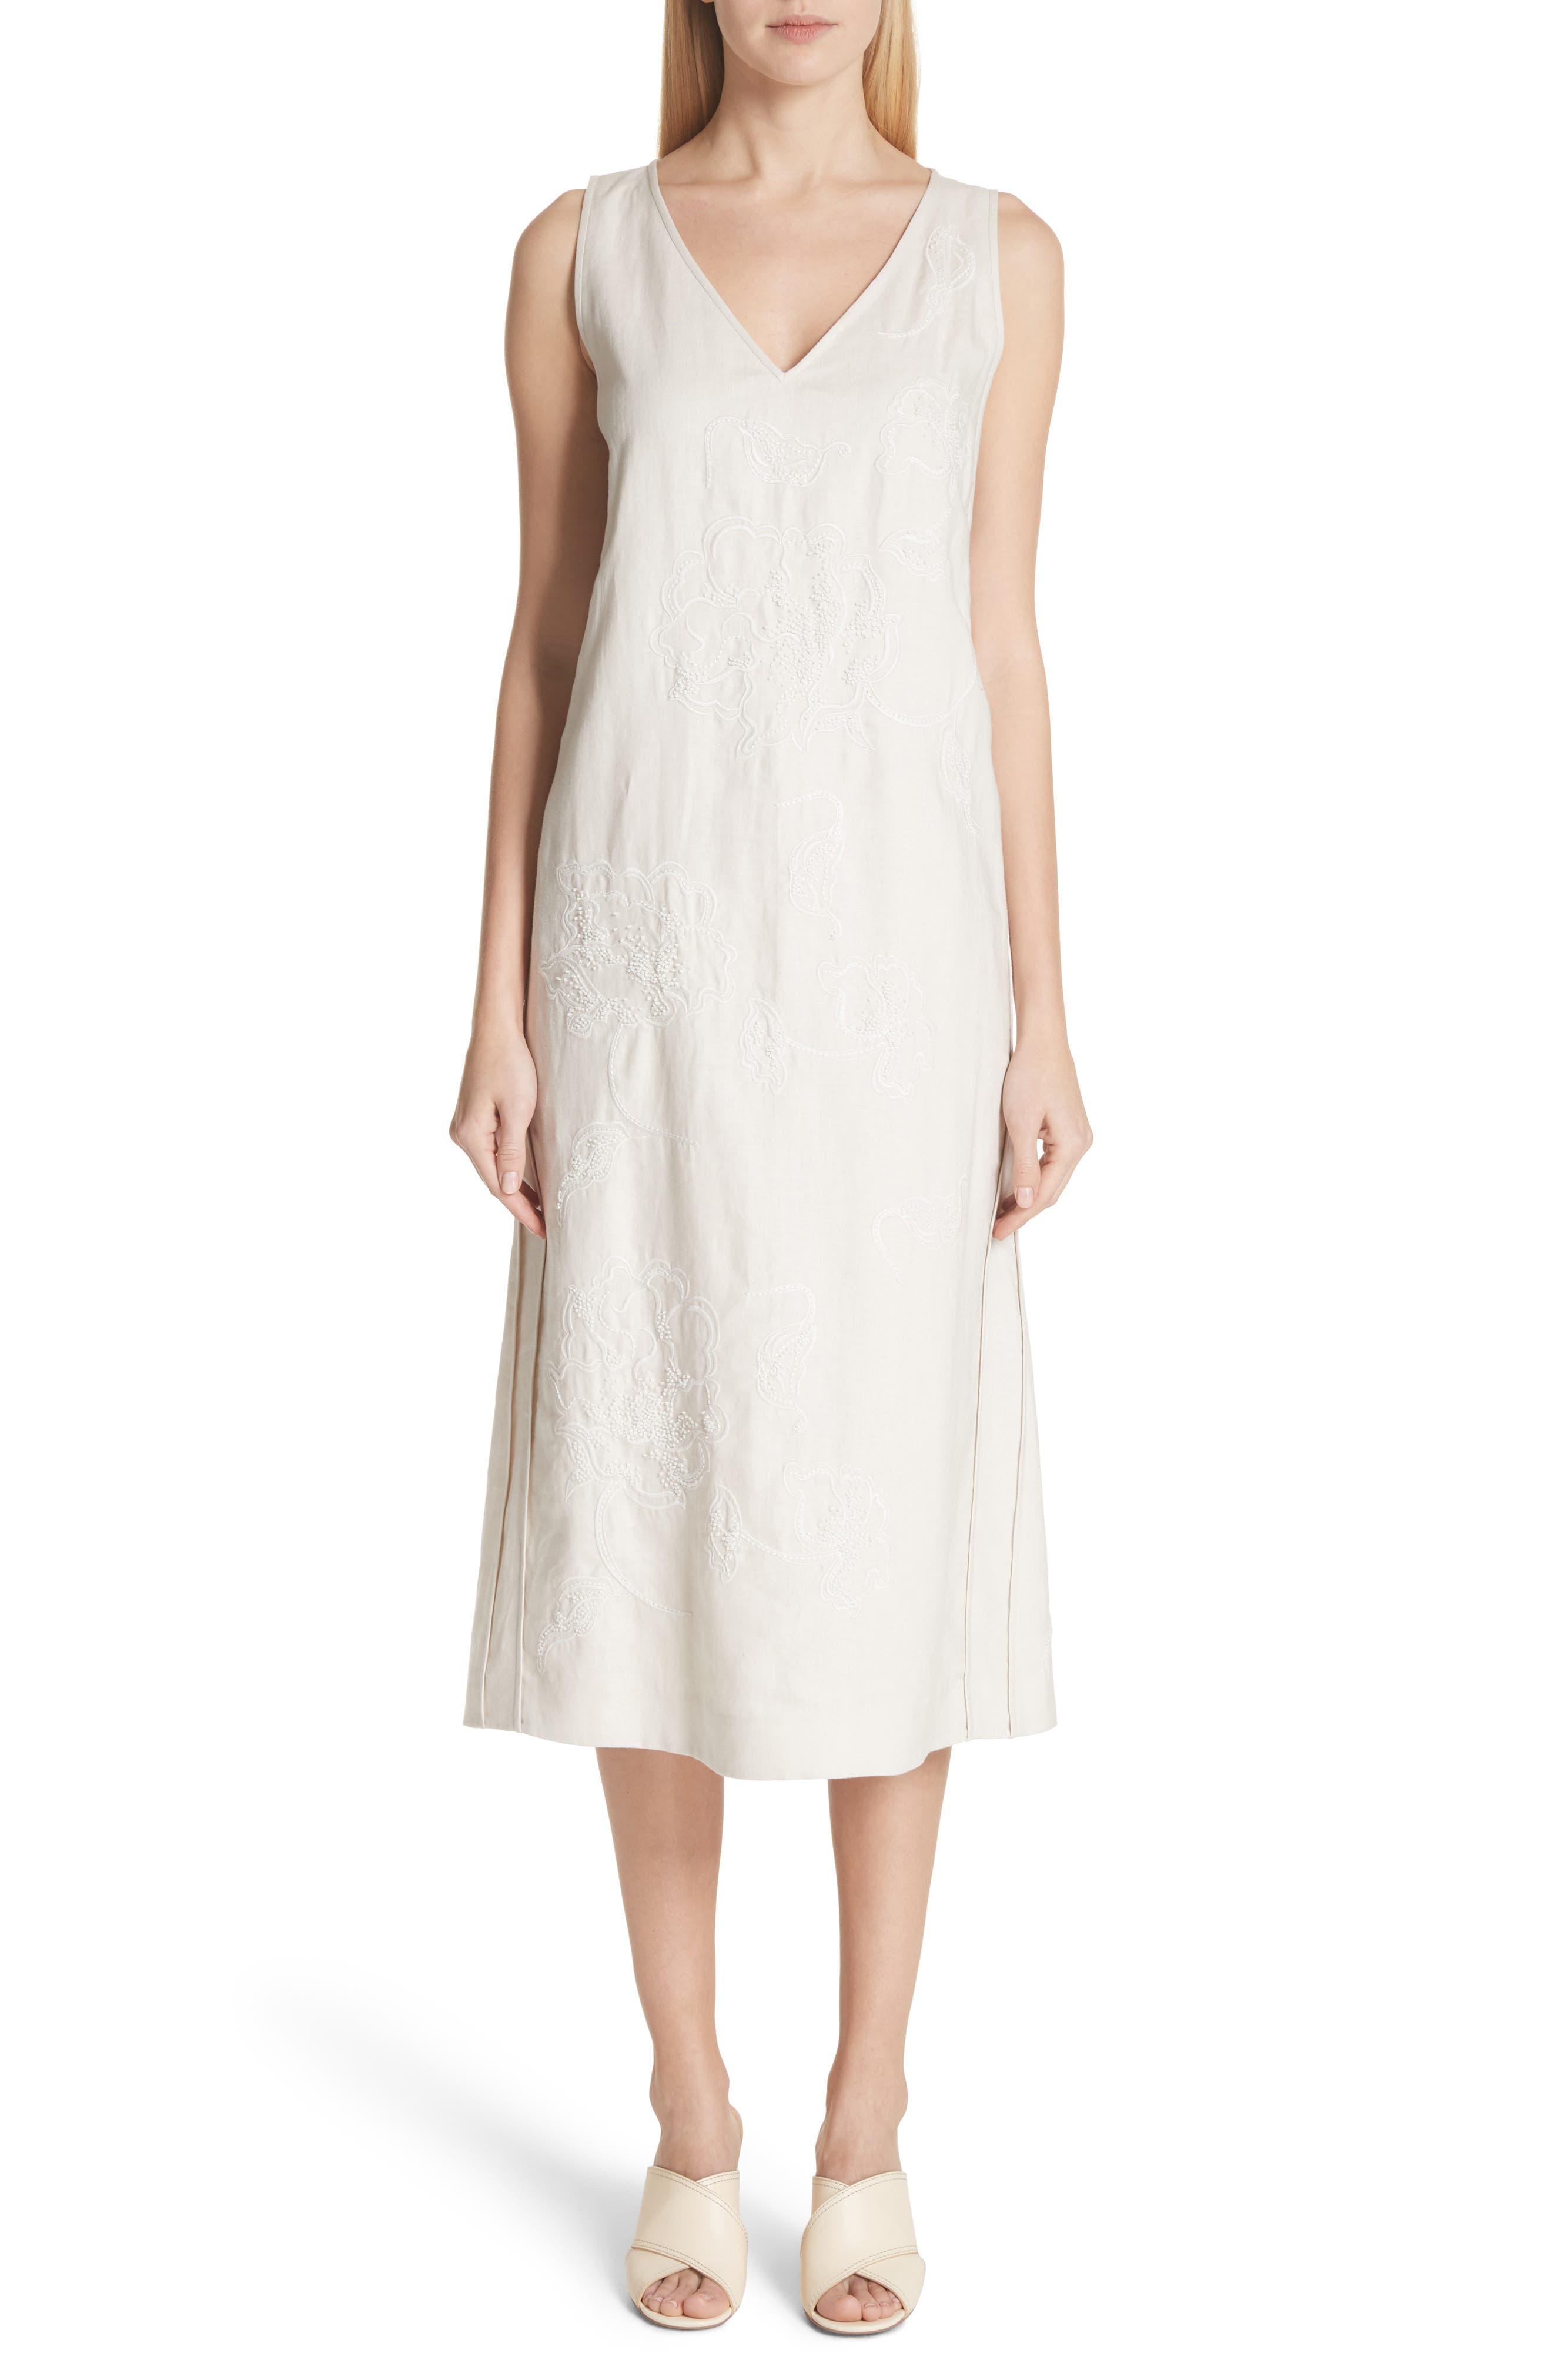 Duncan Embroidered Linen Dress,                             Main thumbnail 1, color,                             Raffia